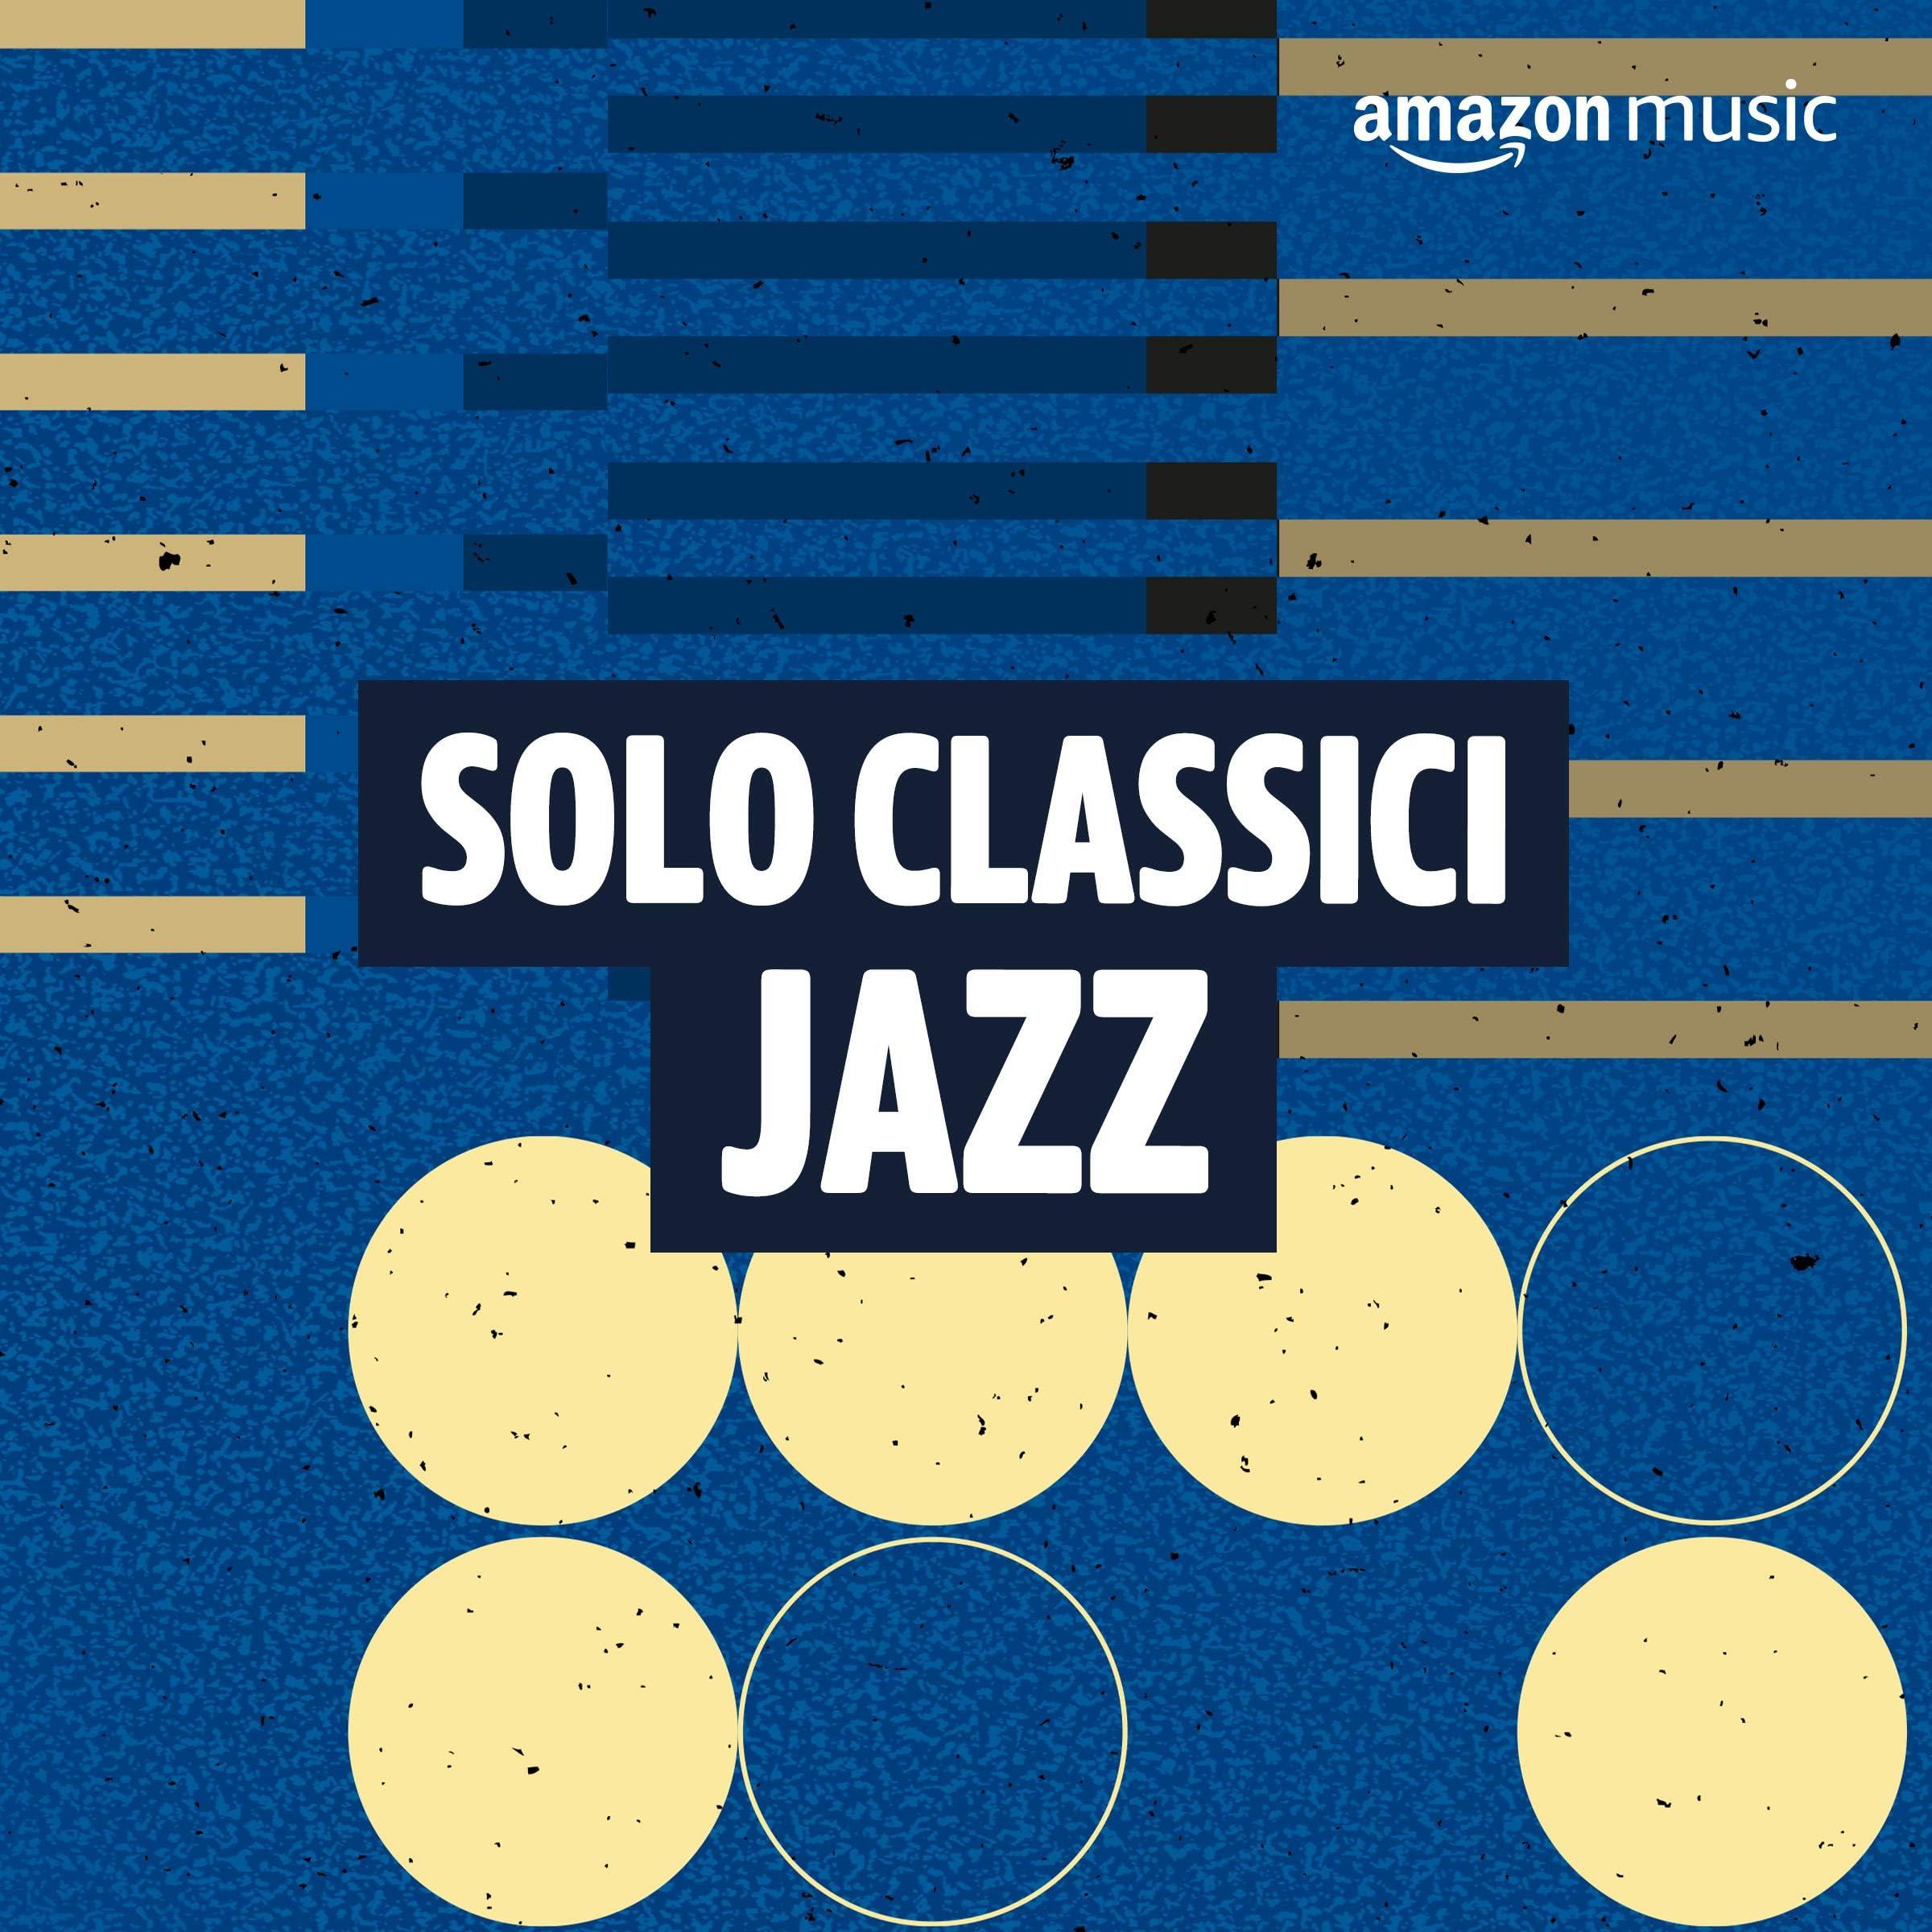 Solo classici jazz